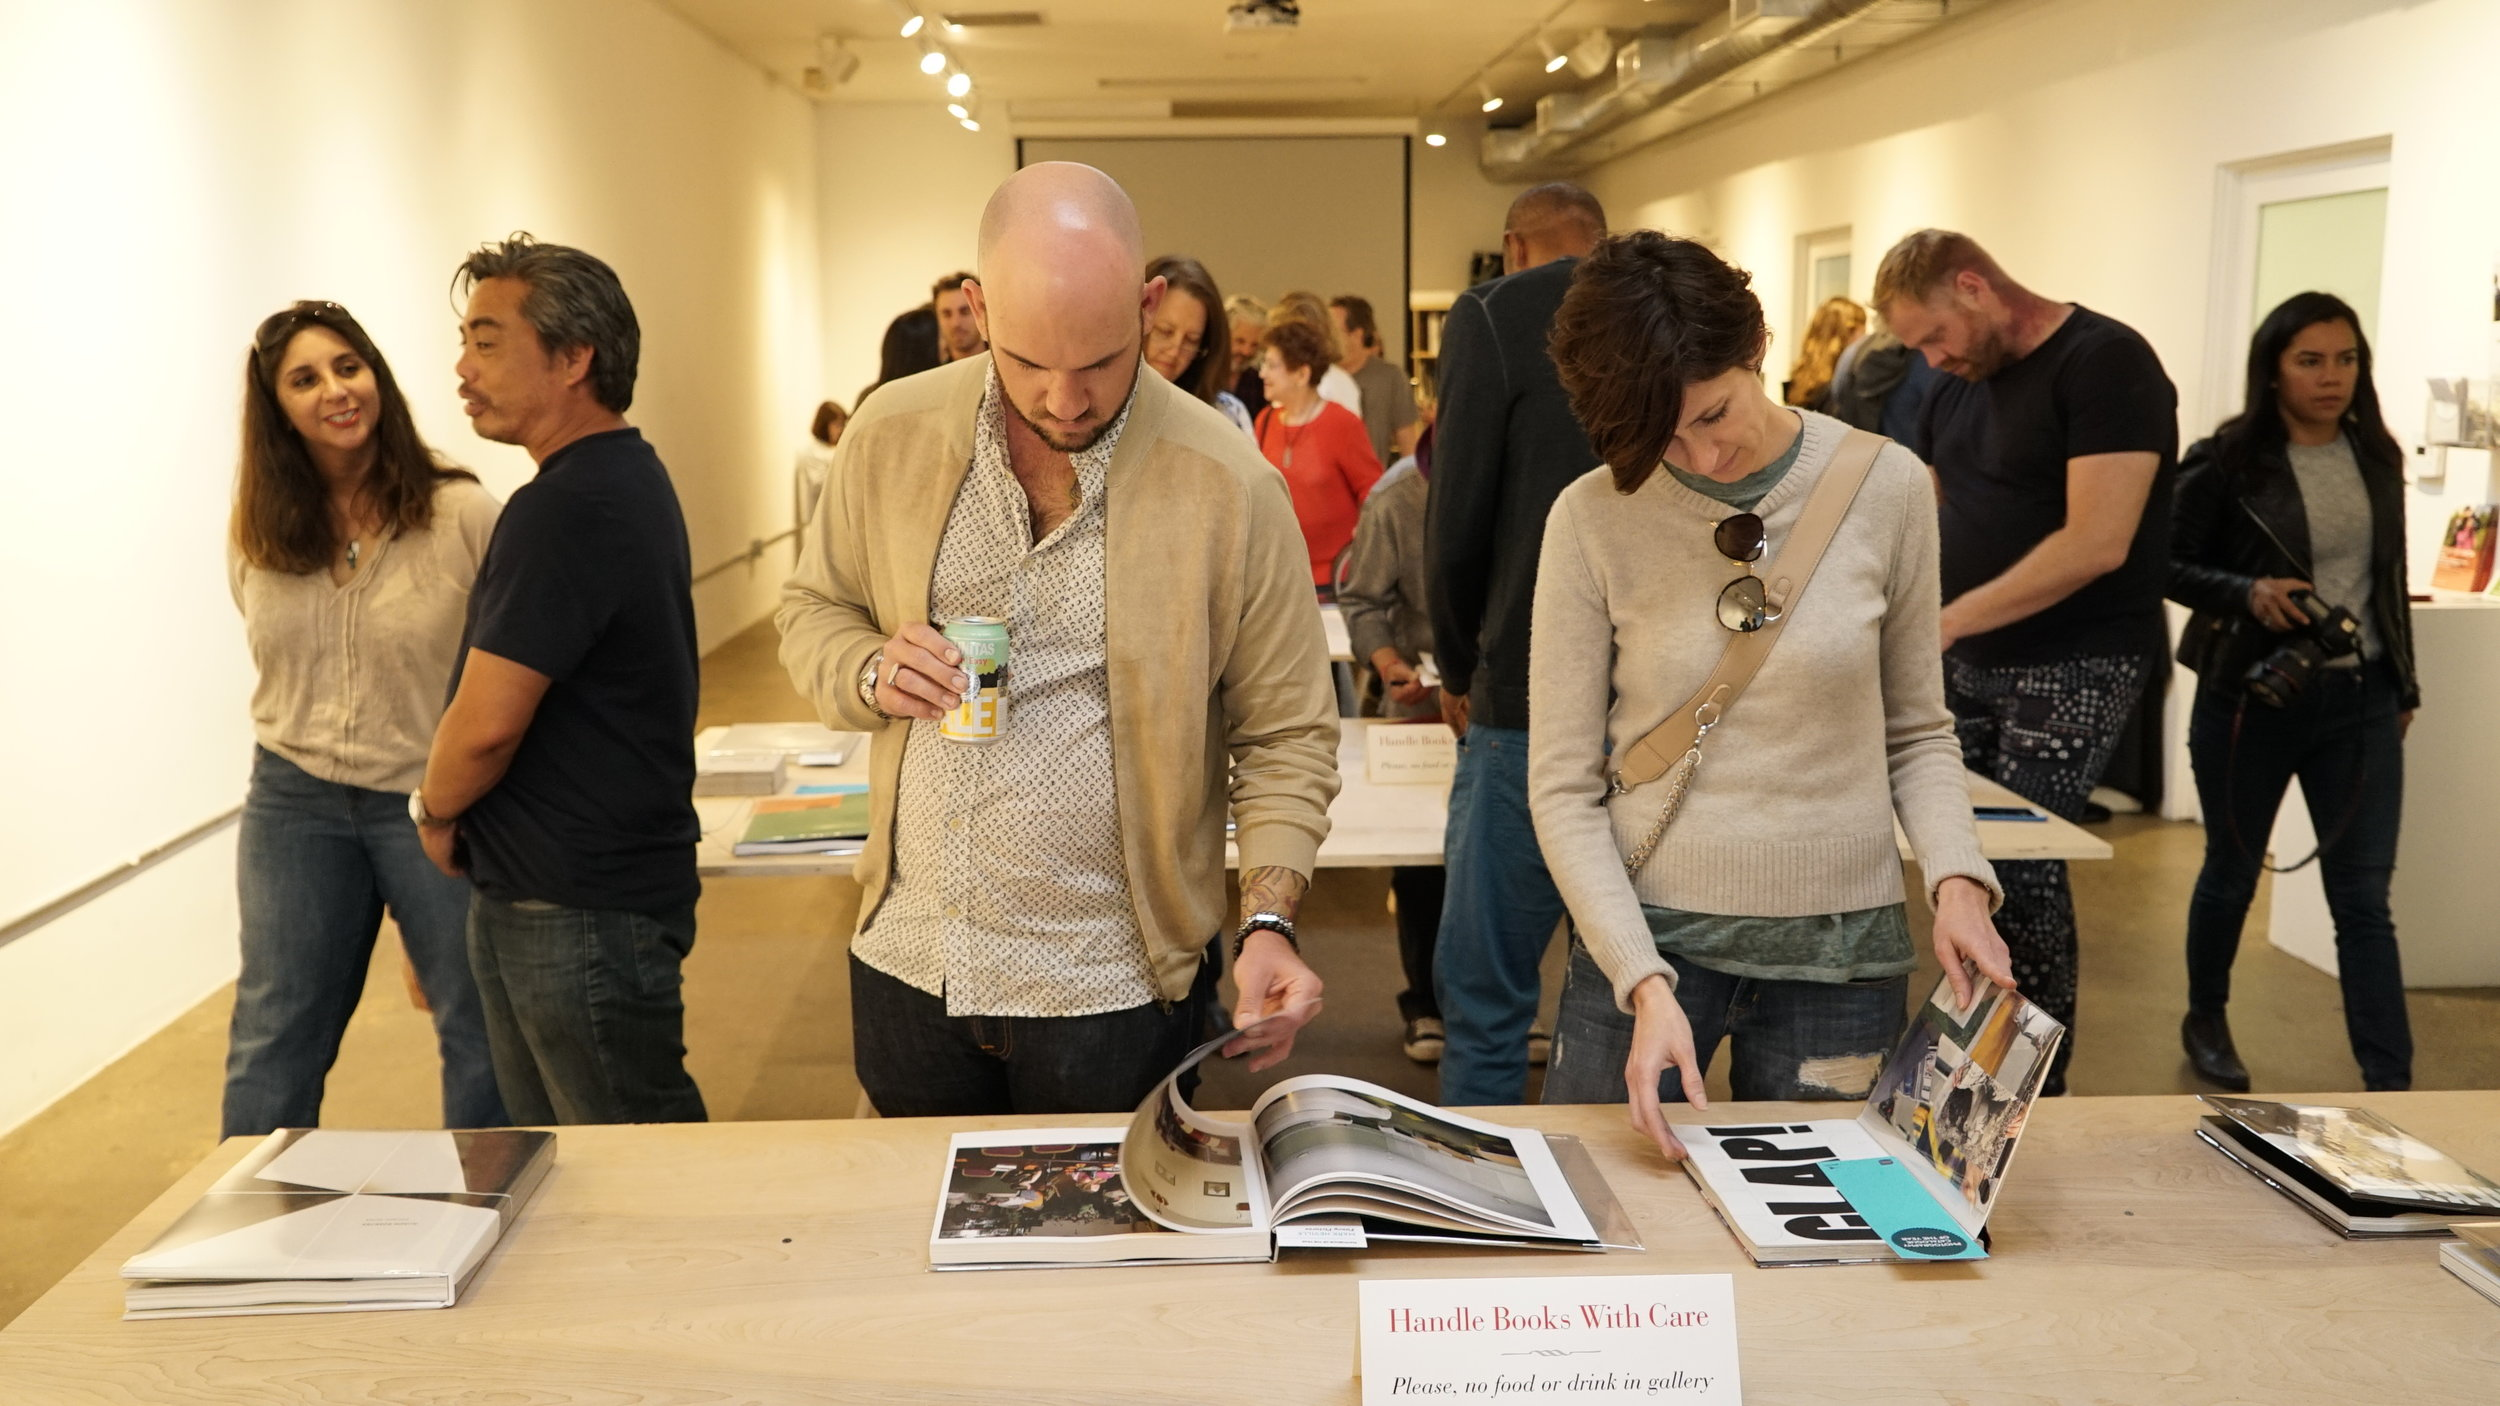 The Paris Photo–Aperture Foundation PhotoBook Awards and MOPLA Photo Book Exhibition